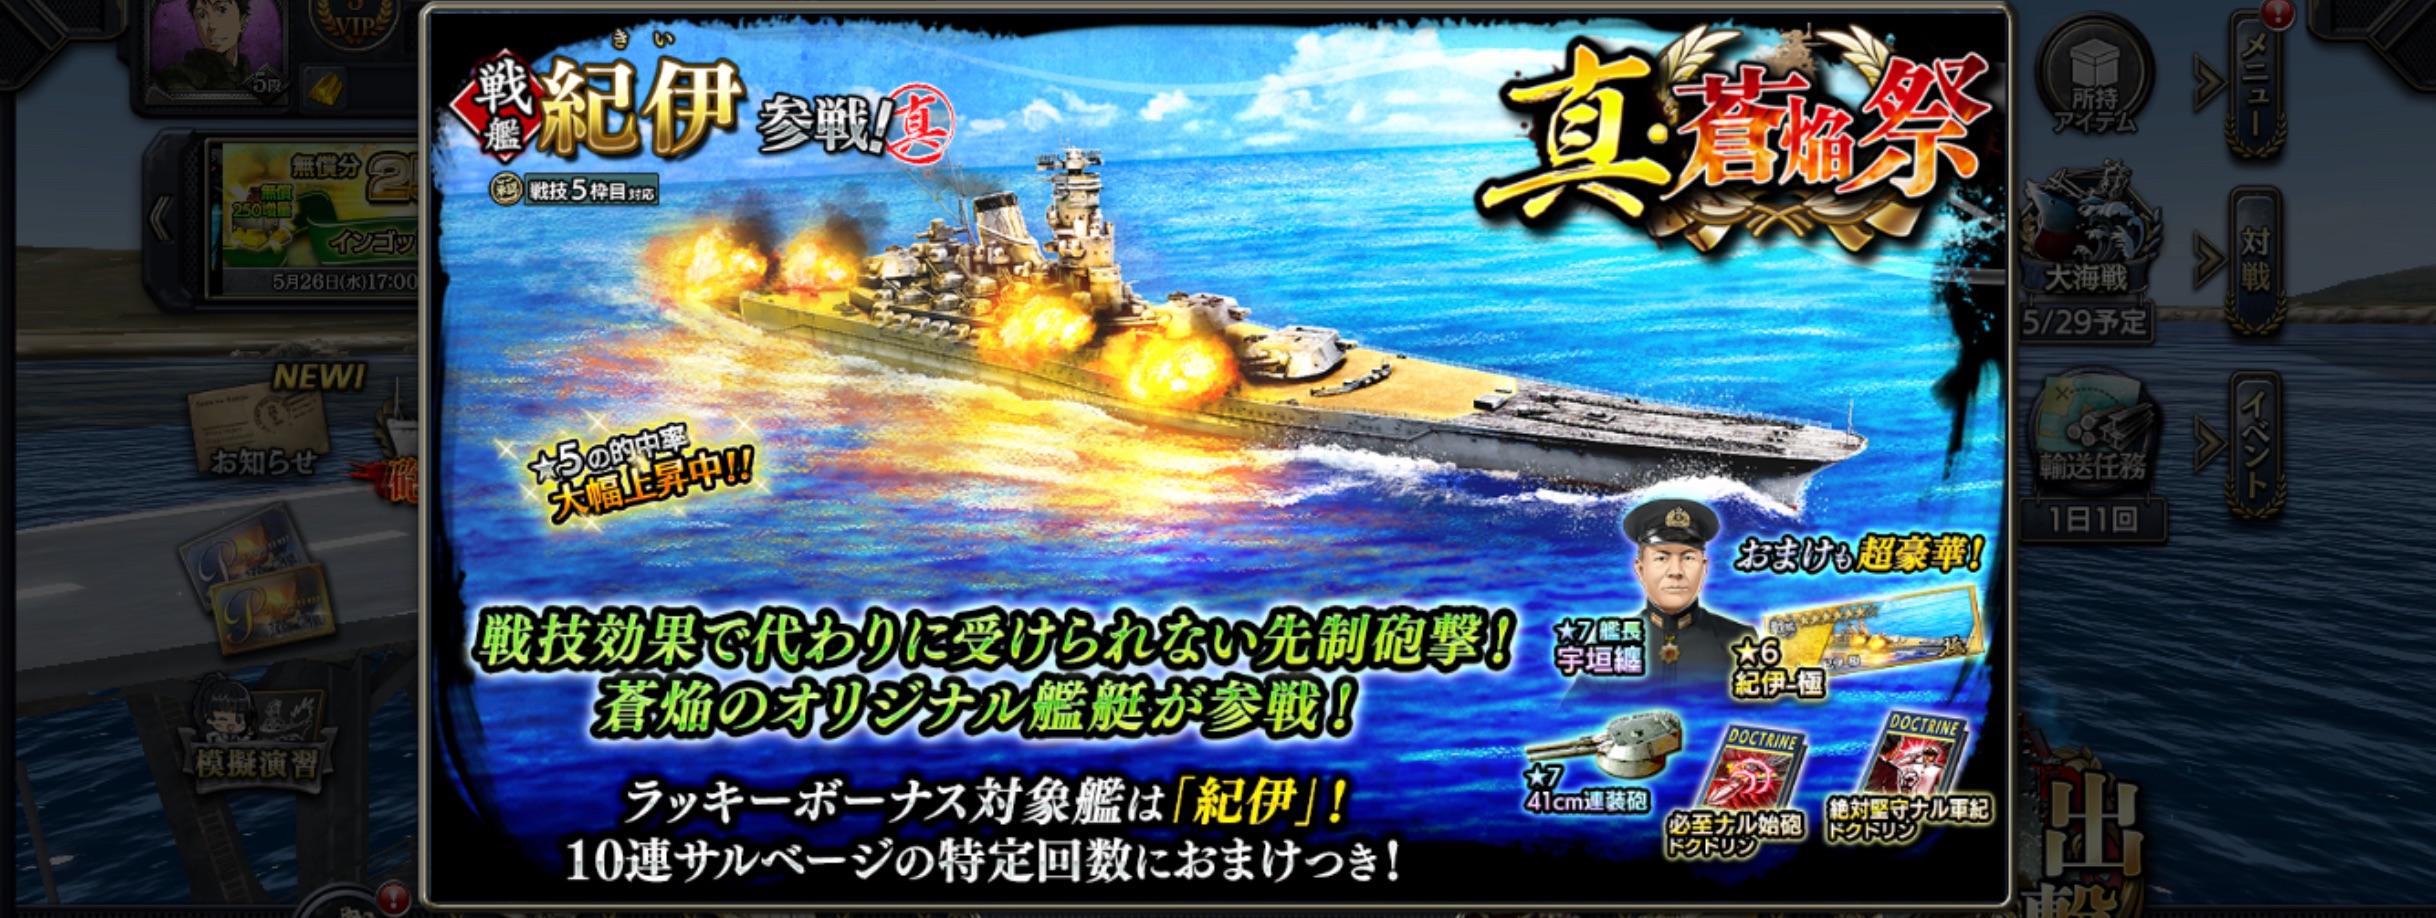 battleship-Kii